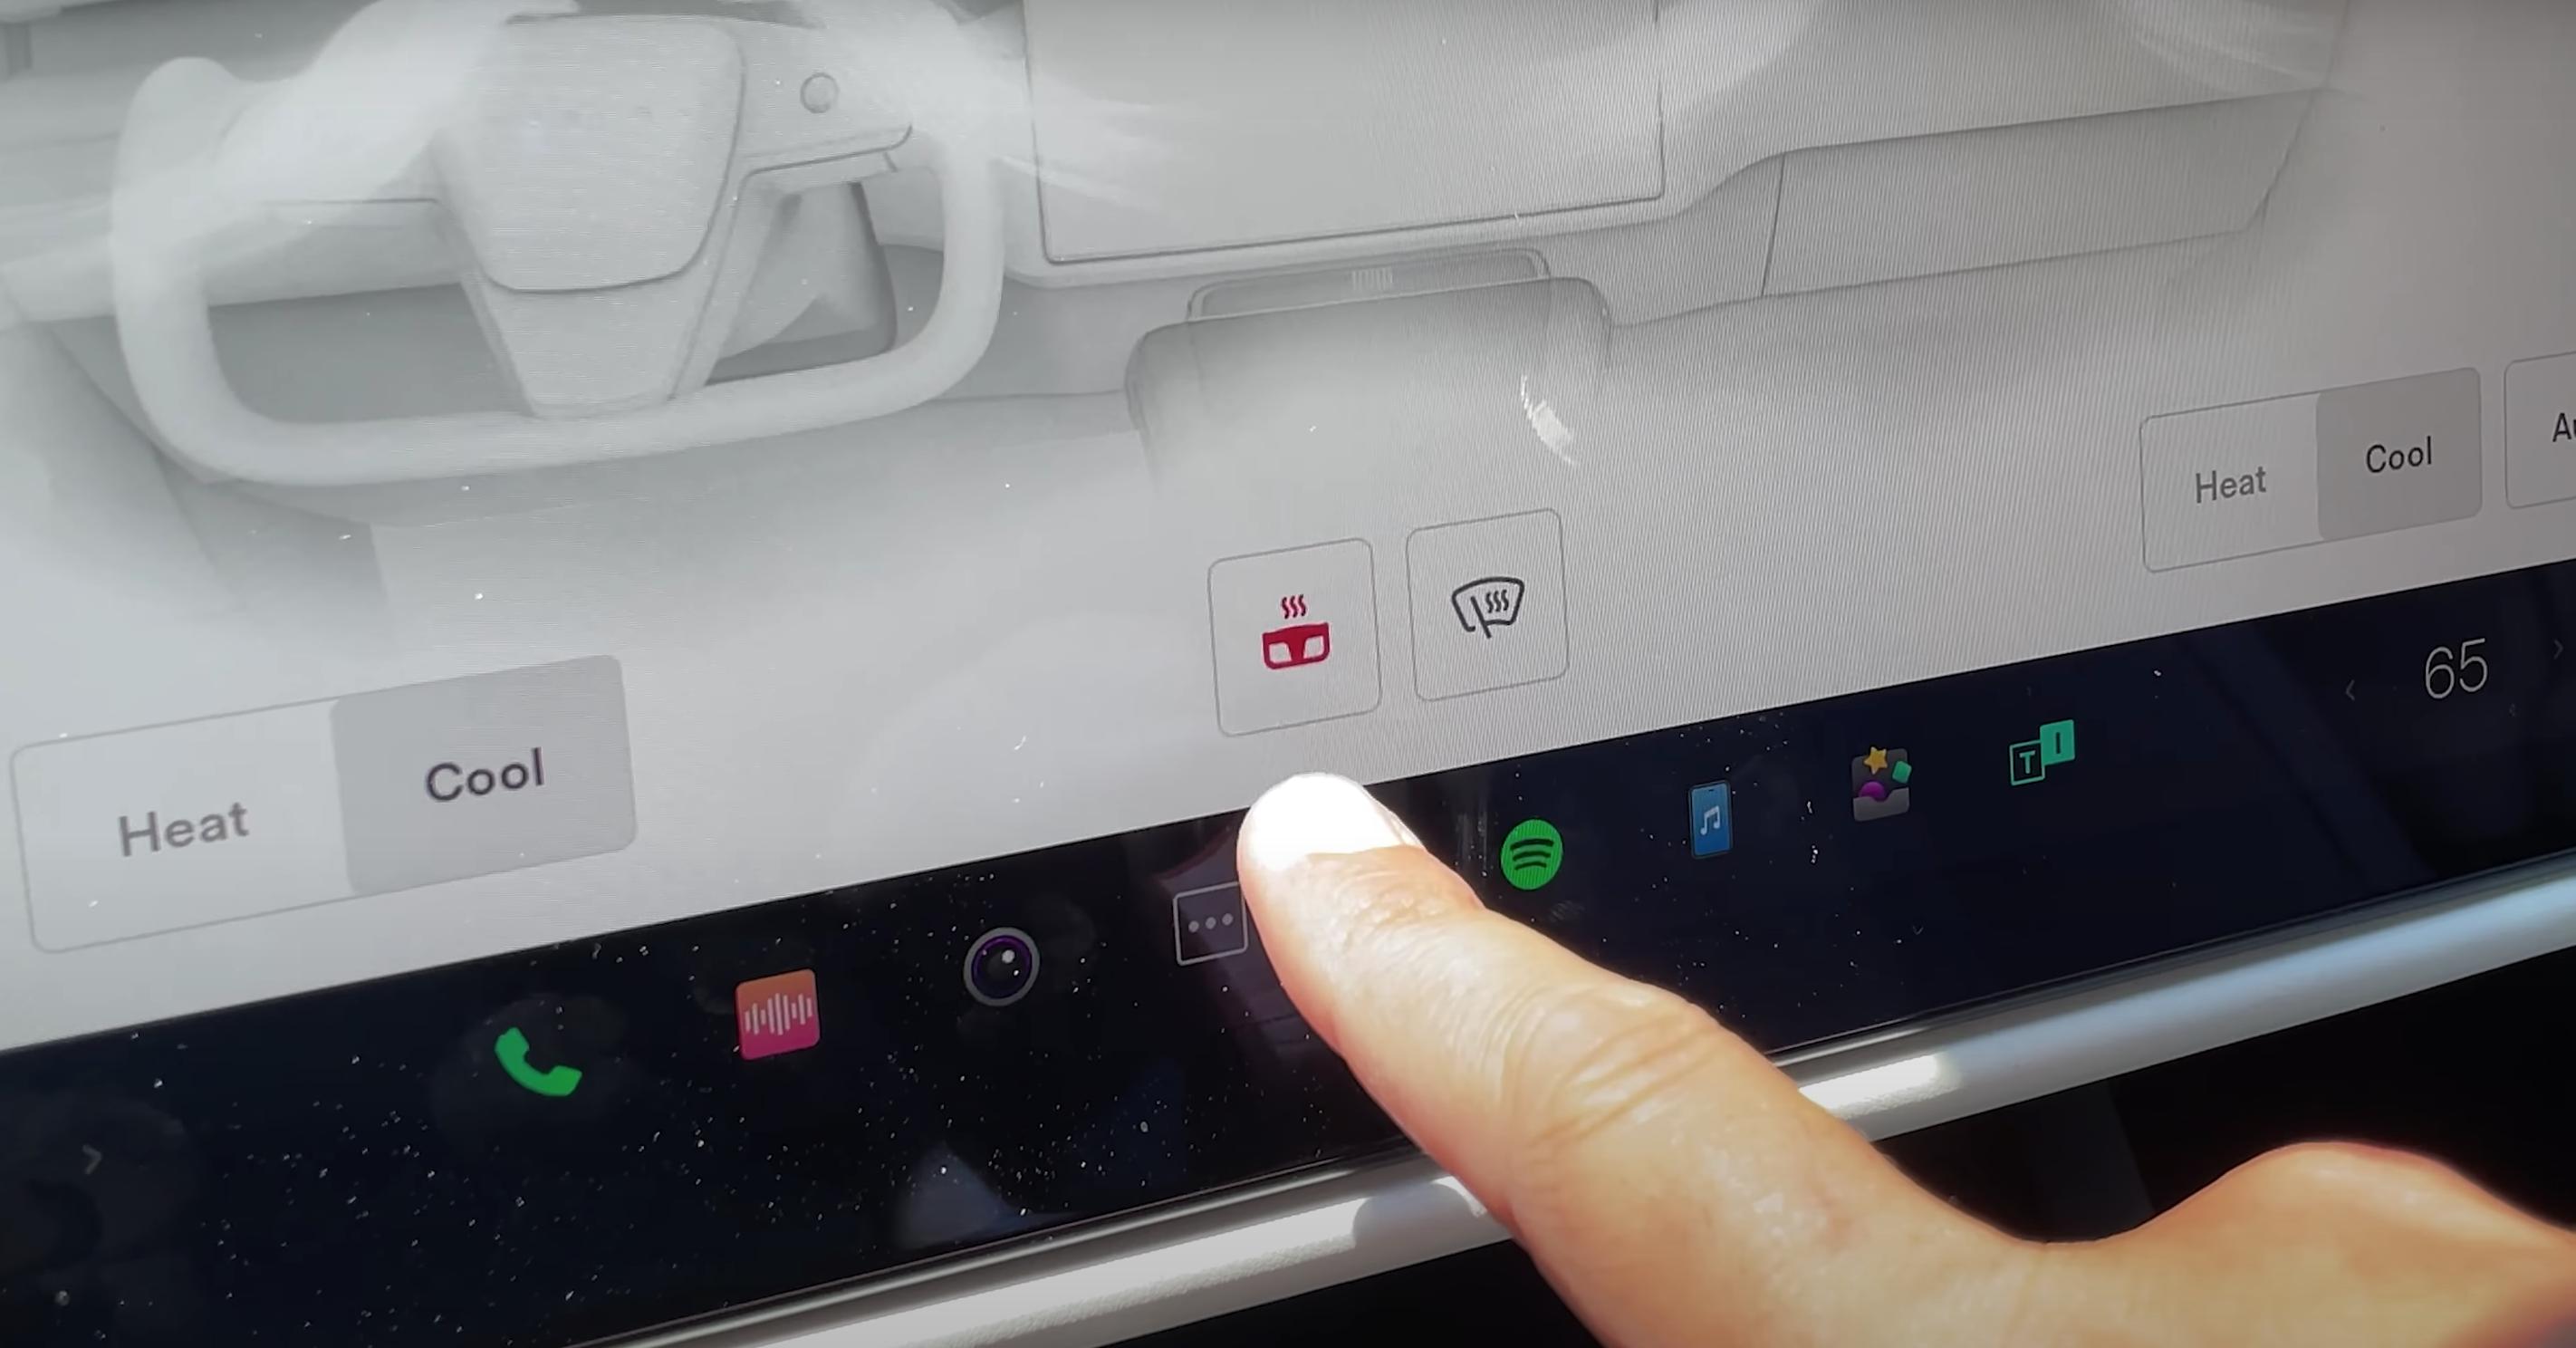 Adjusting the steering wheel temperature through pressing a steering wheel icon